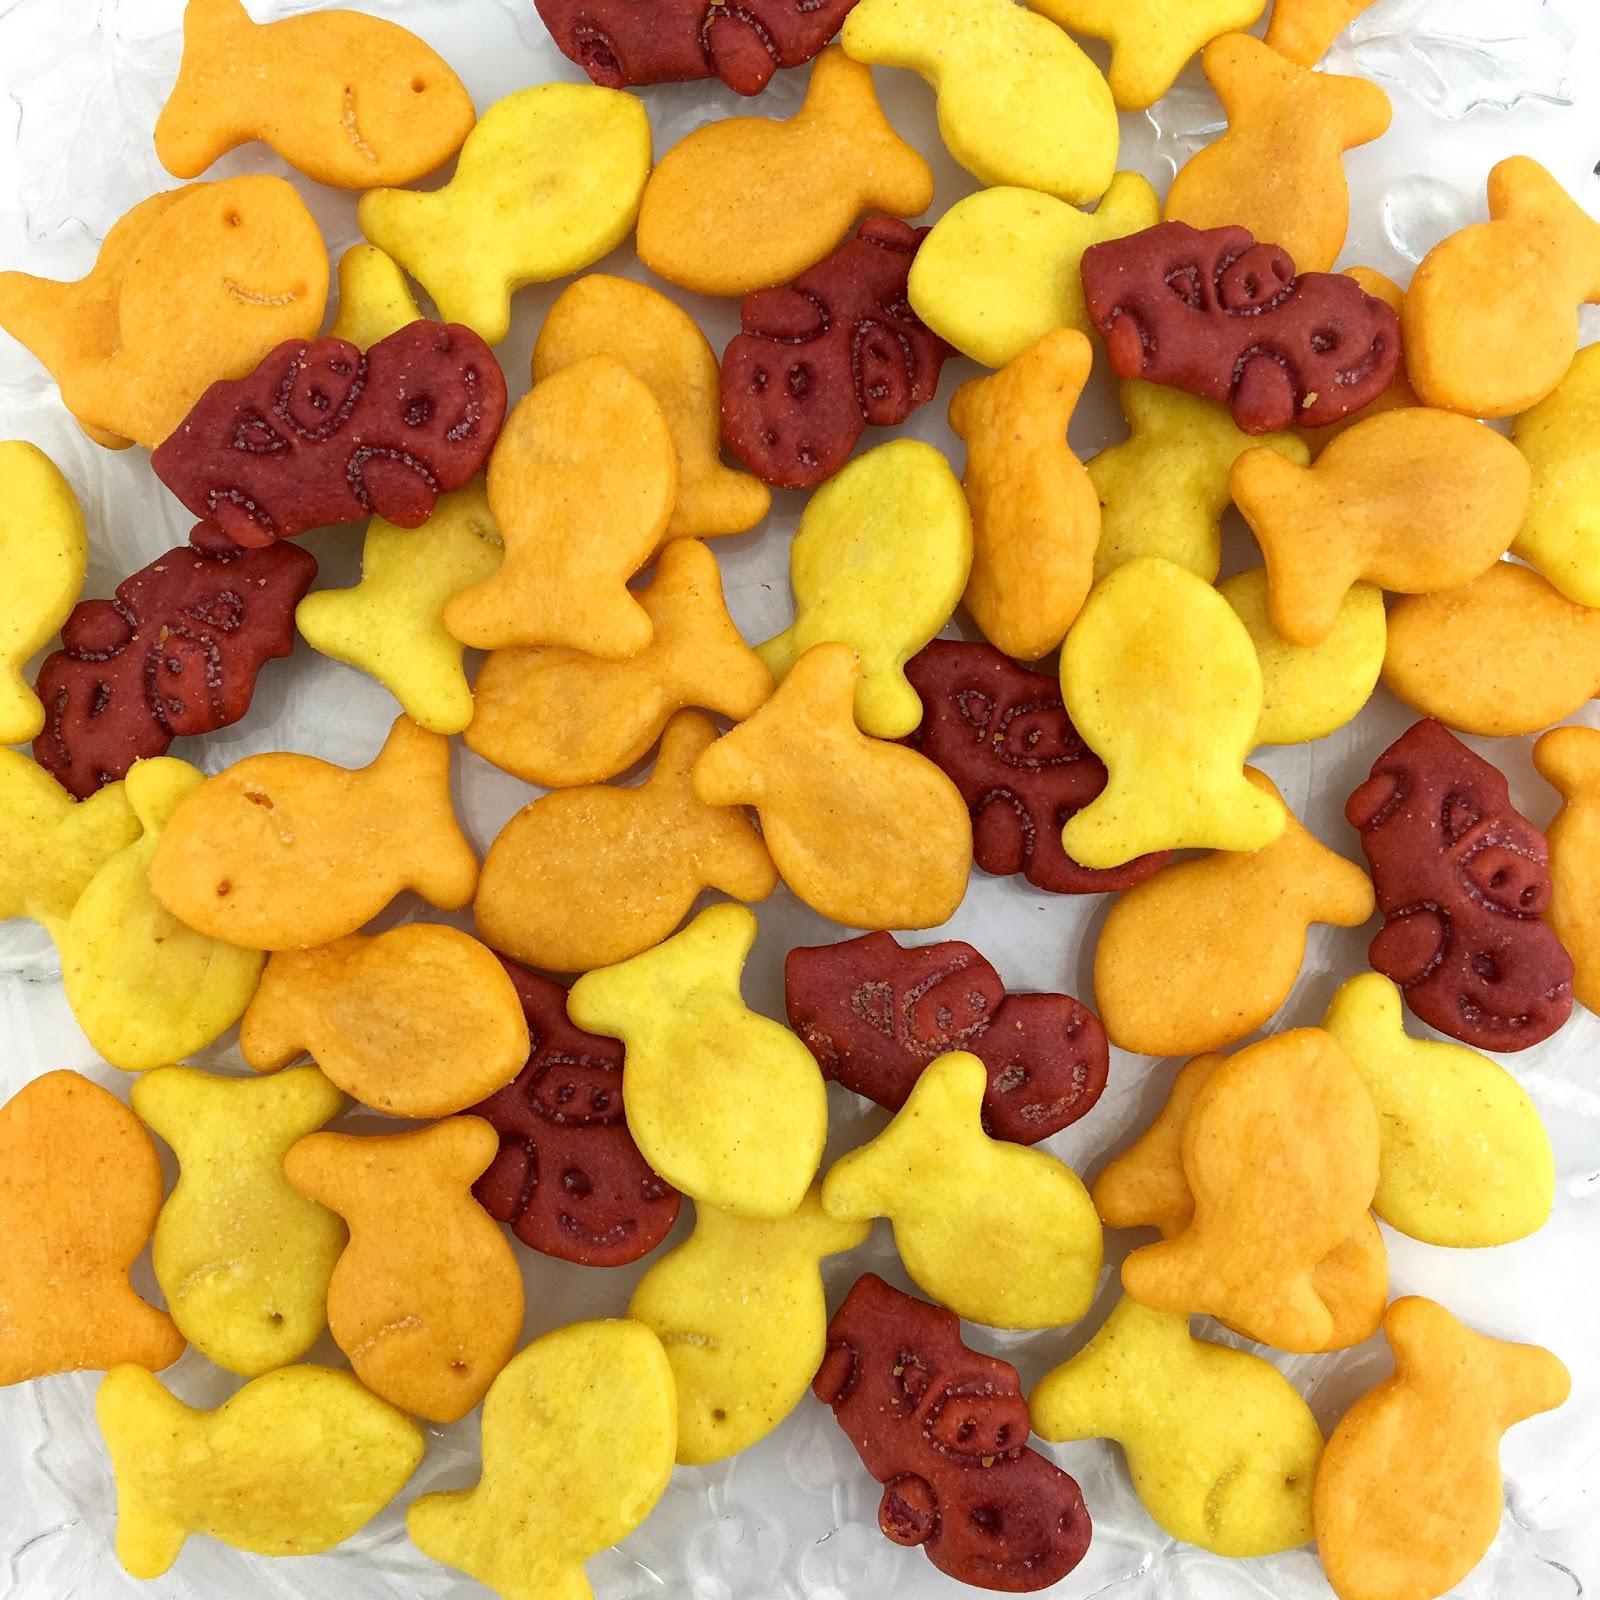 disney pixar Cars 3 Pepperidge Farm Goldfish